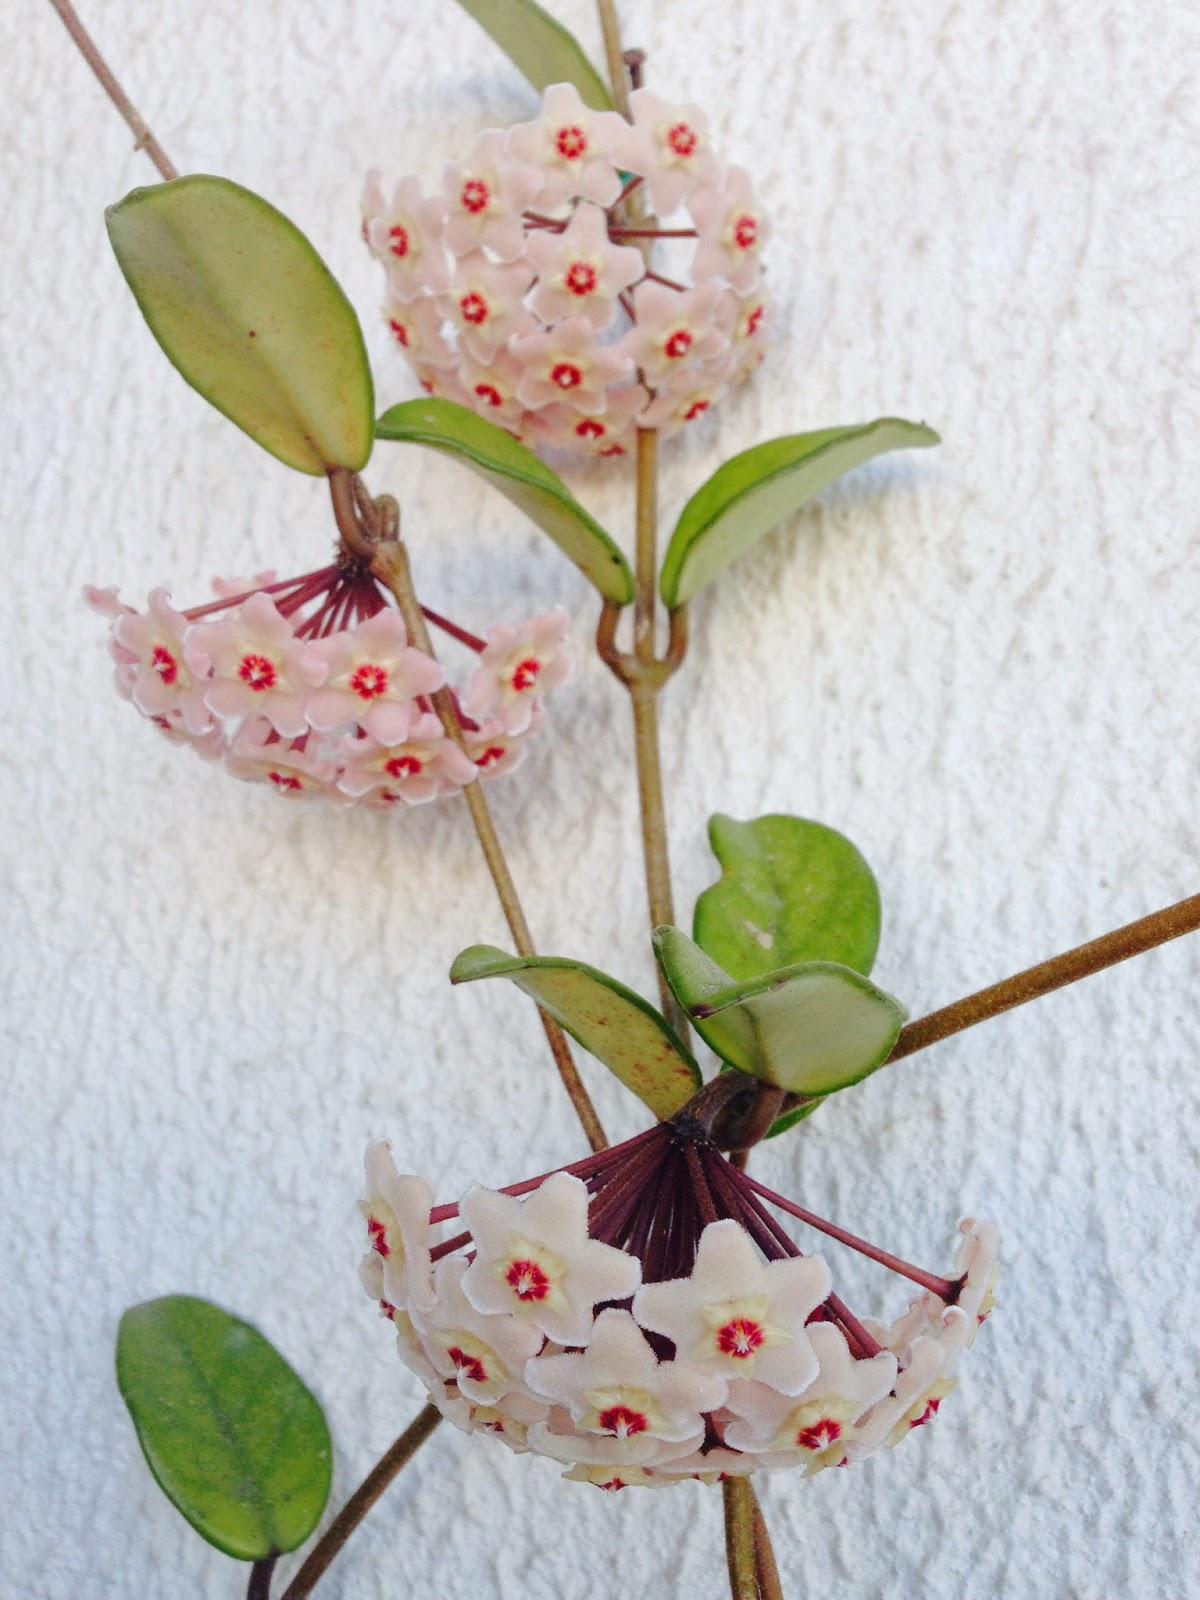 Hoya carnosa ou flor-de-cera